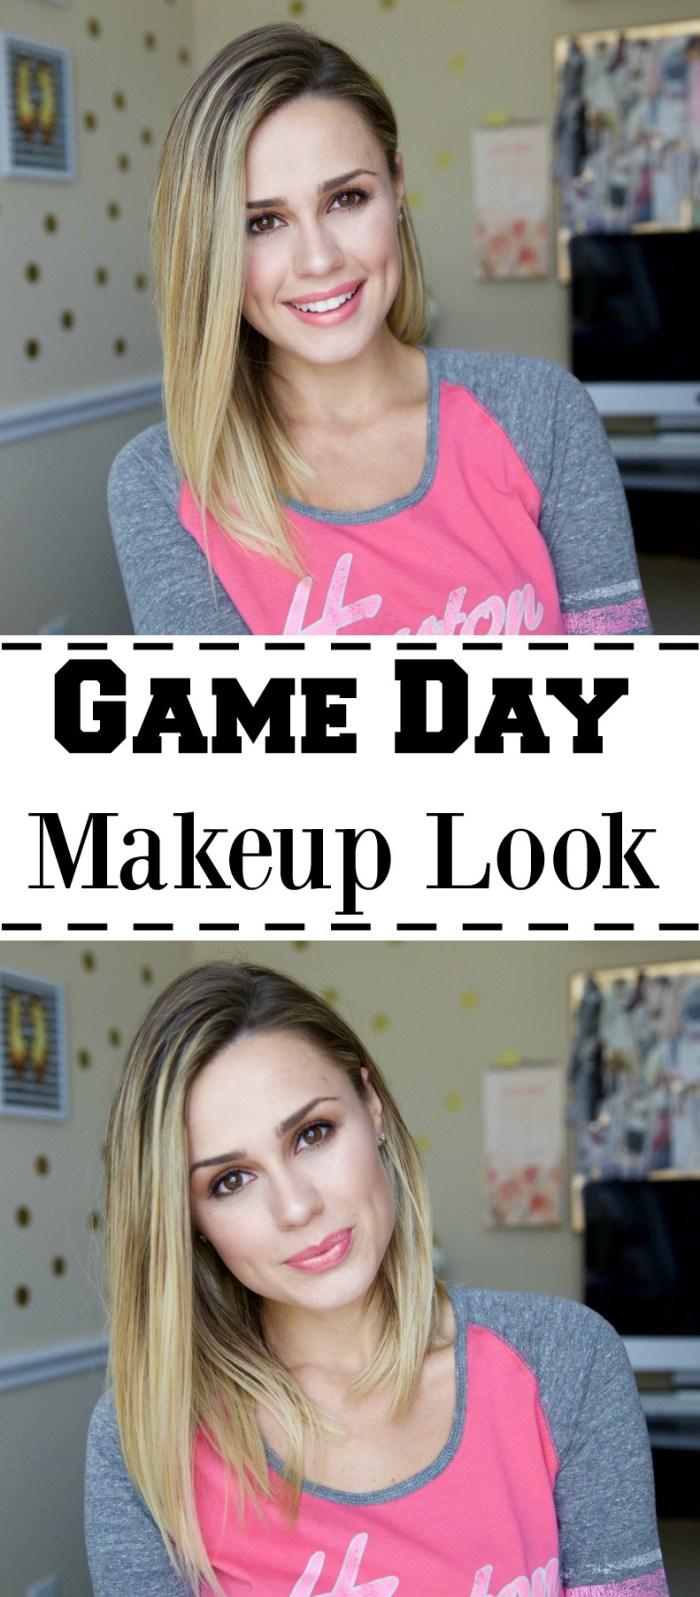 Game Day Makeup look   Drugstore Makeup Look   Drugstore Tutorial   Uptown with Elly Brown